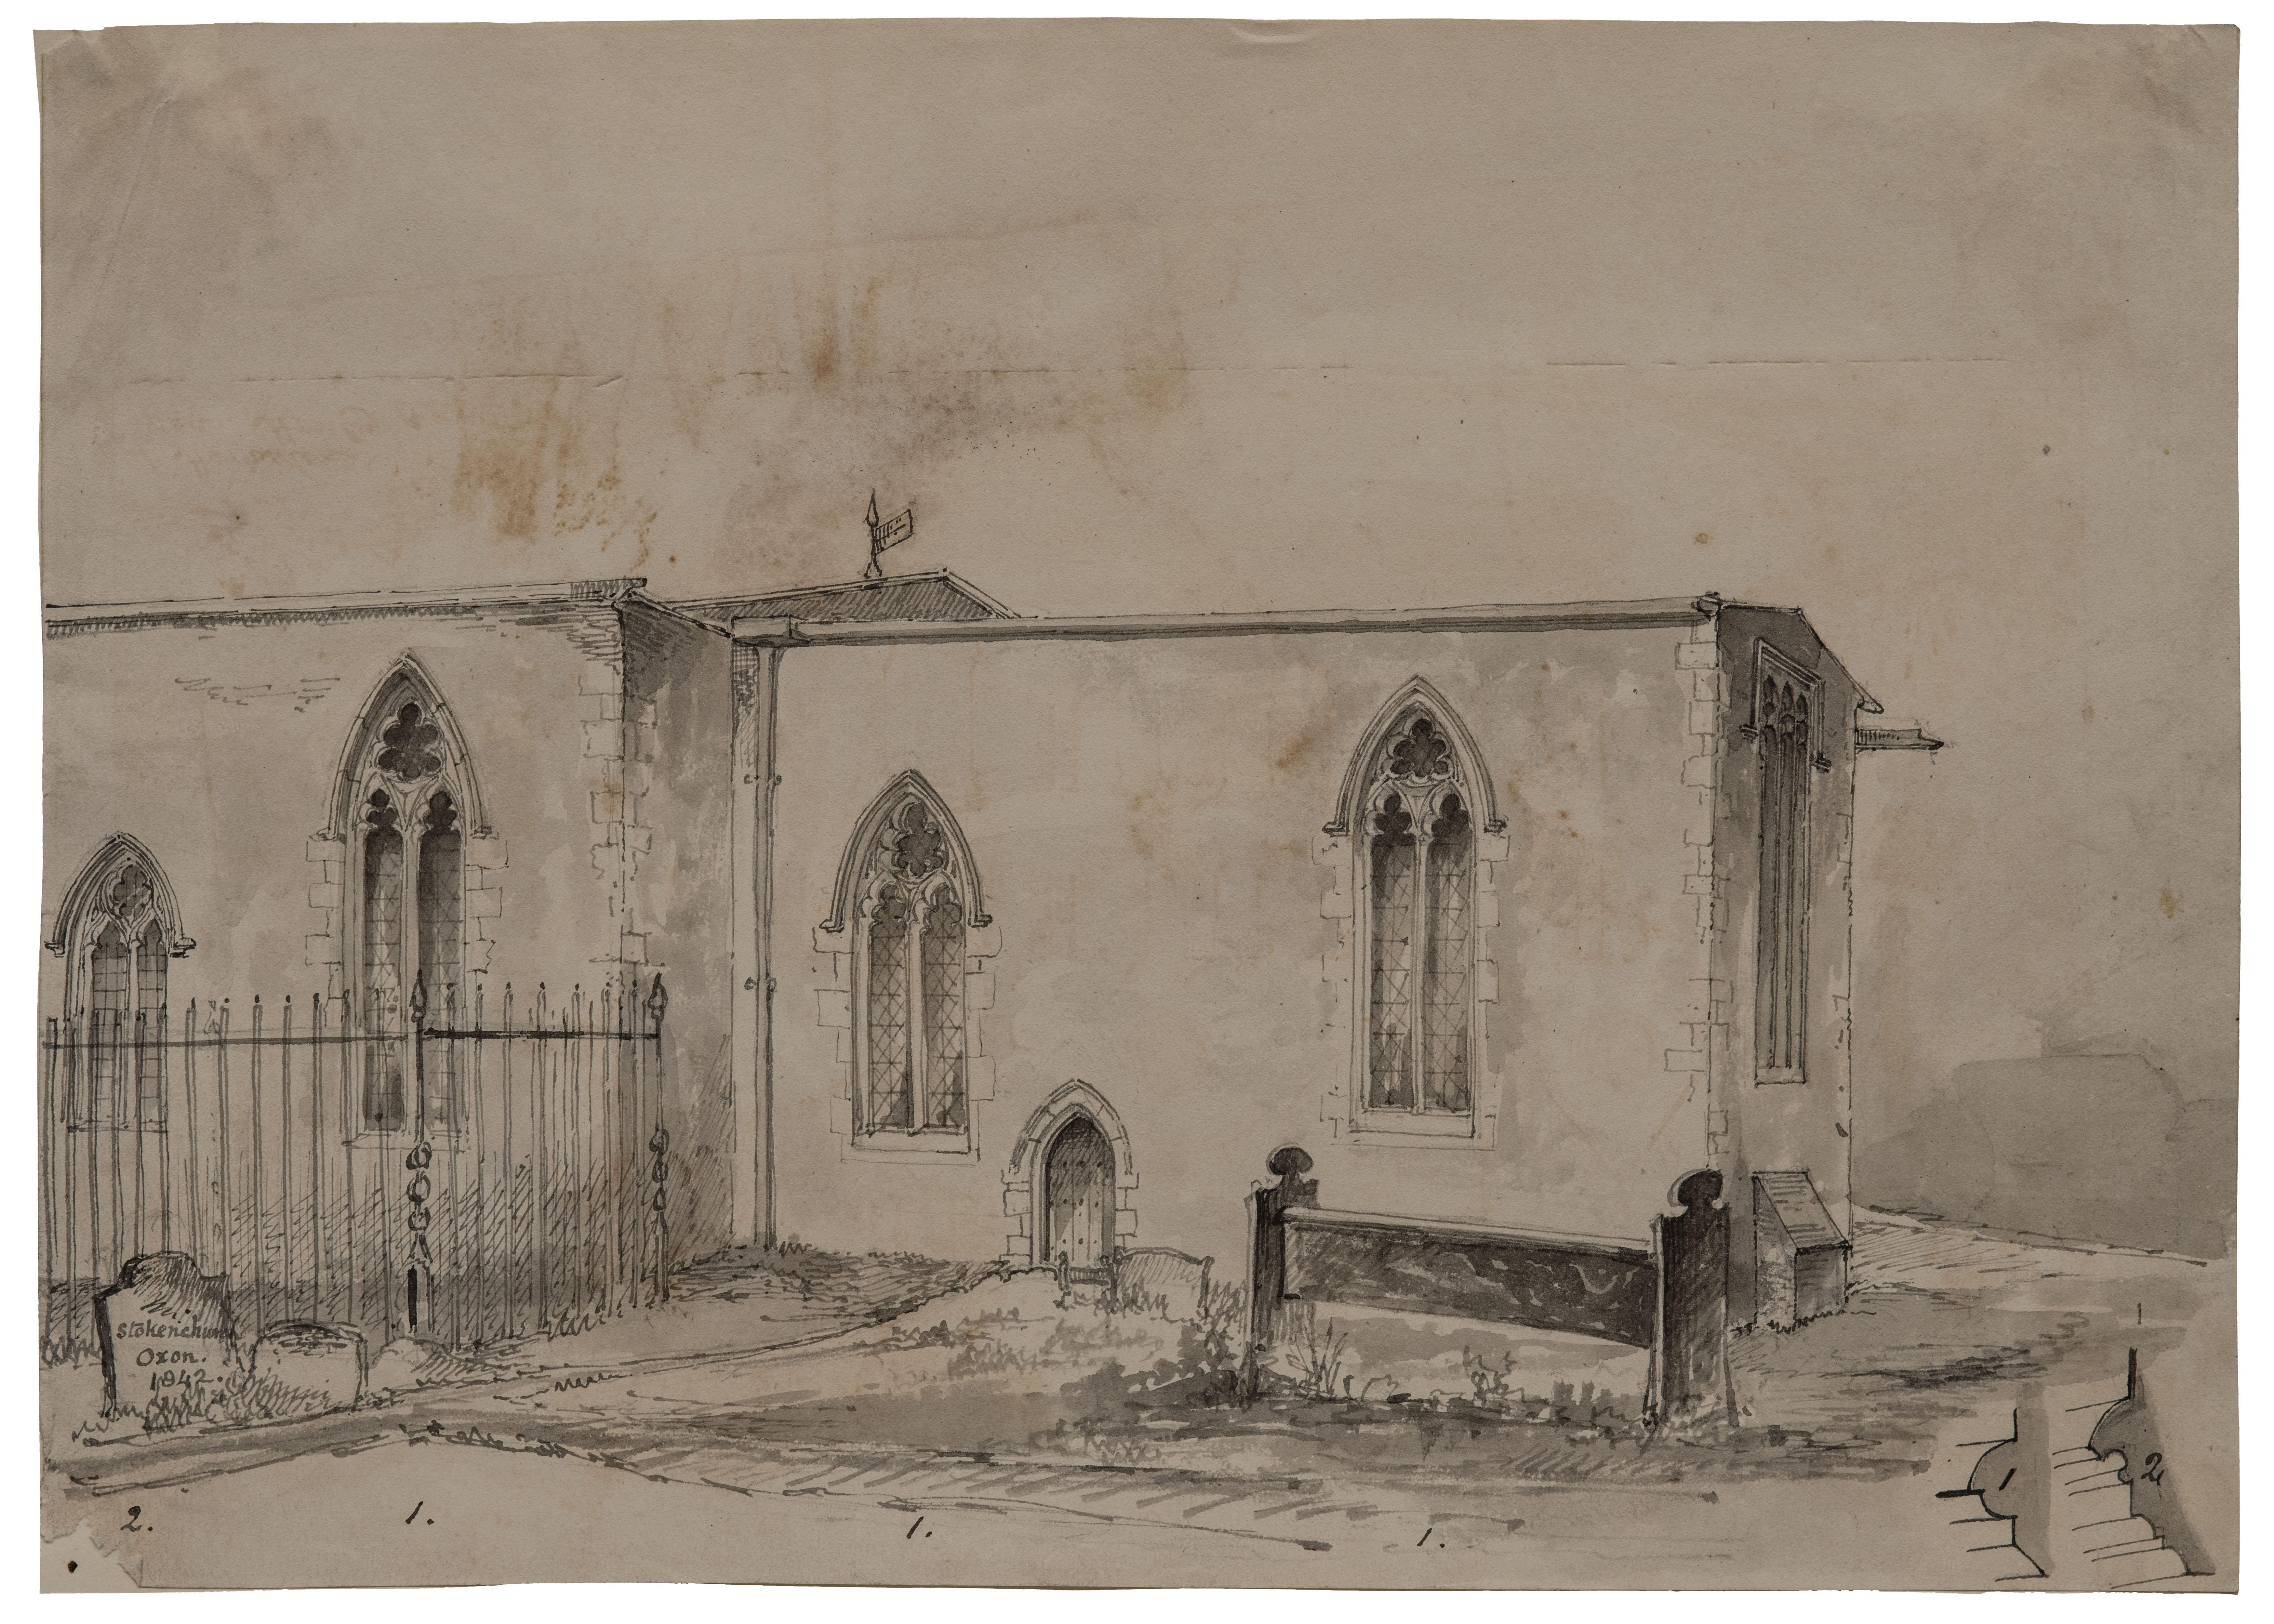 Stokenchurch British drawing